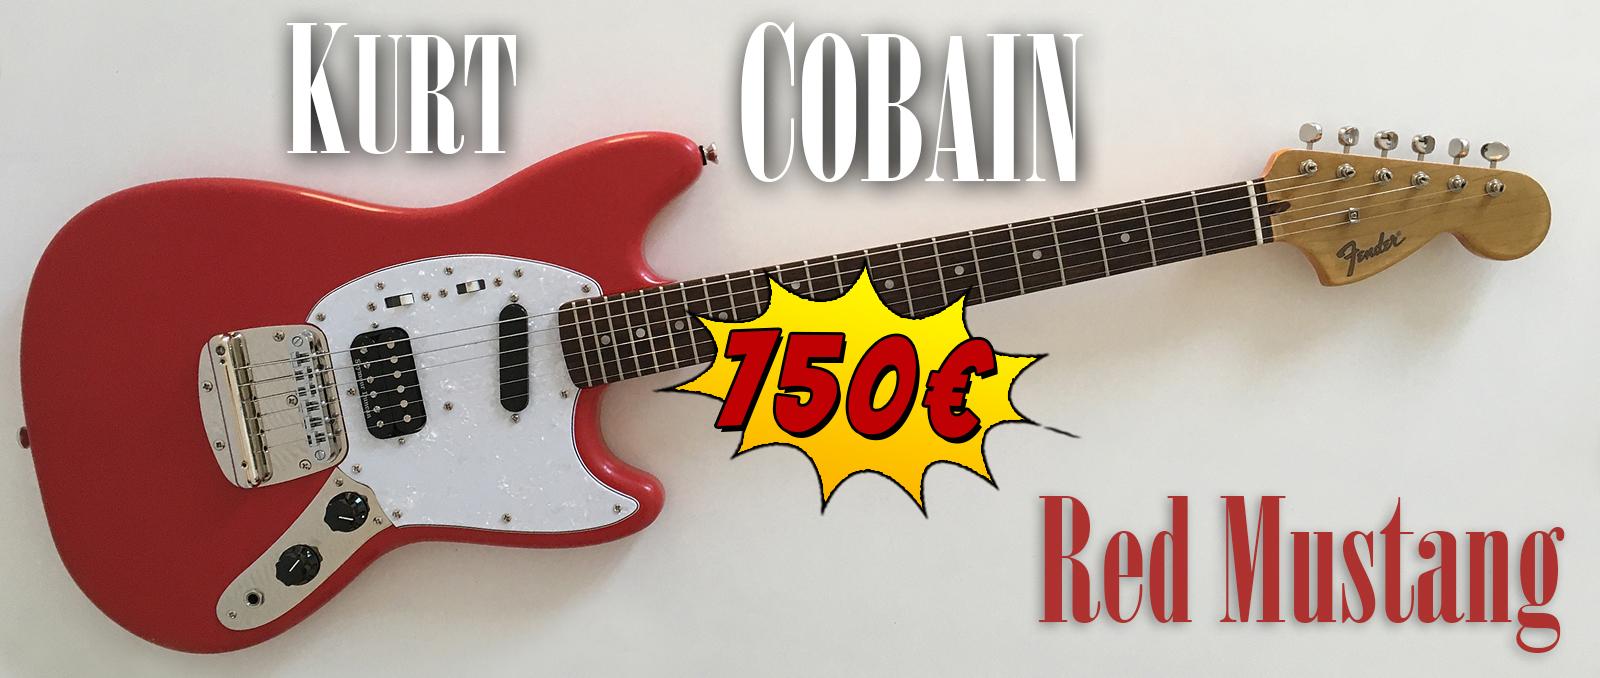 Kurt-Cobain-Fender-Red-Mustang-NPA-Nulle-Part-Ailleurs-Squier-guitar-relic-Nirvana-france-khristore